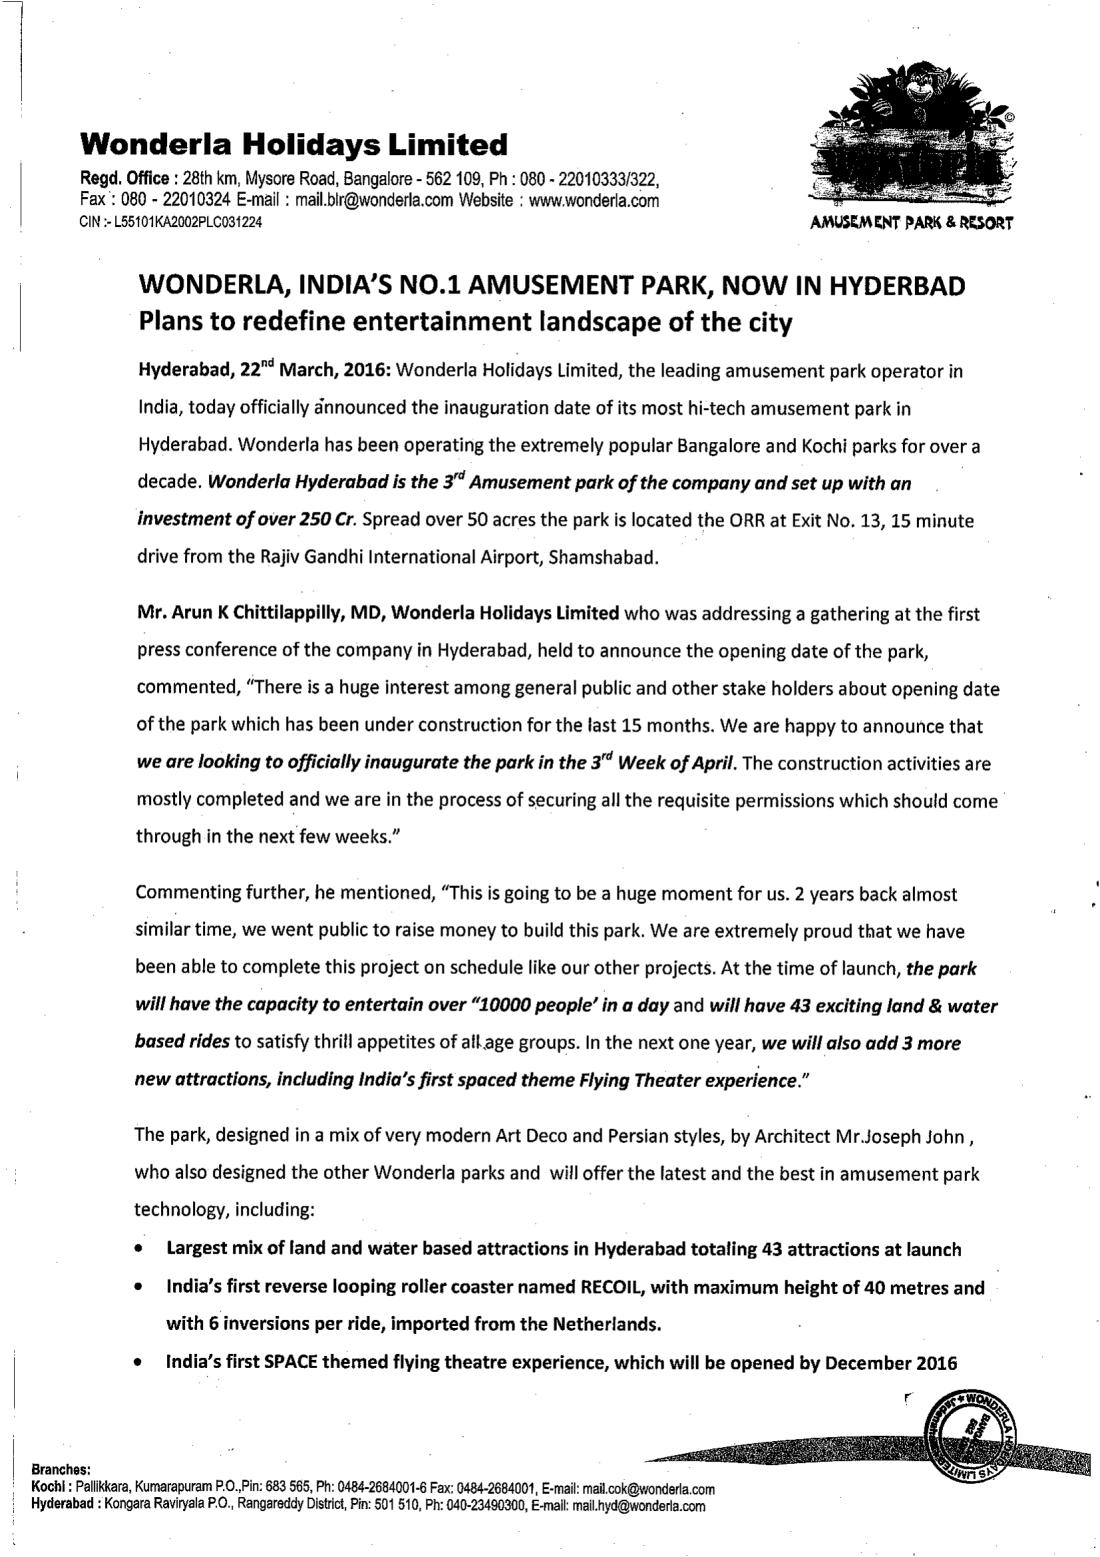 Wonderla Amusement Parks & Resort  PressReleaseHydpark-1